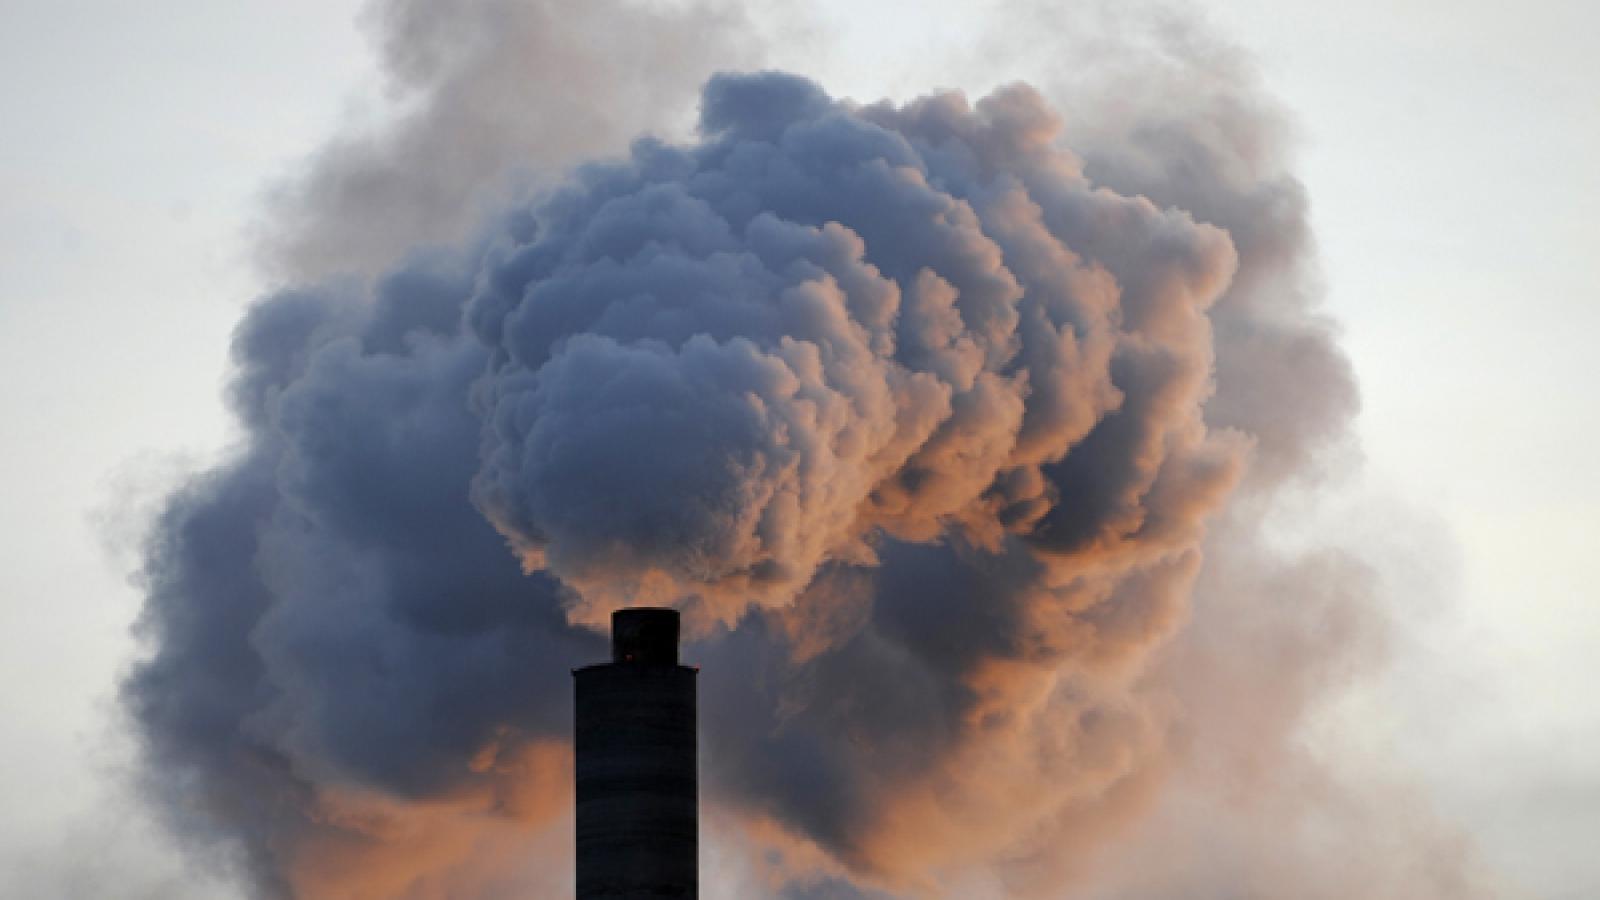 UN-CLIMATE-FINLAND-THAILAND-ASIA-CLIMATE-WARMING-UN-UNFCCC